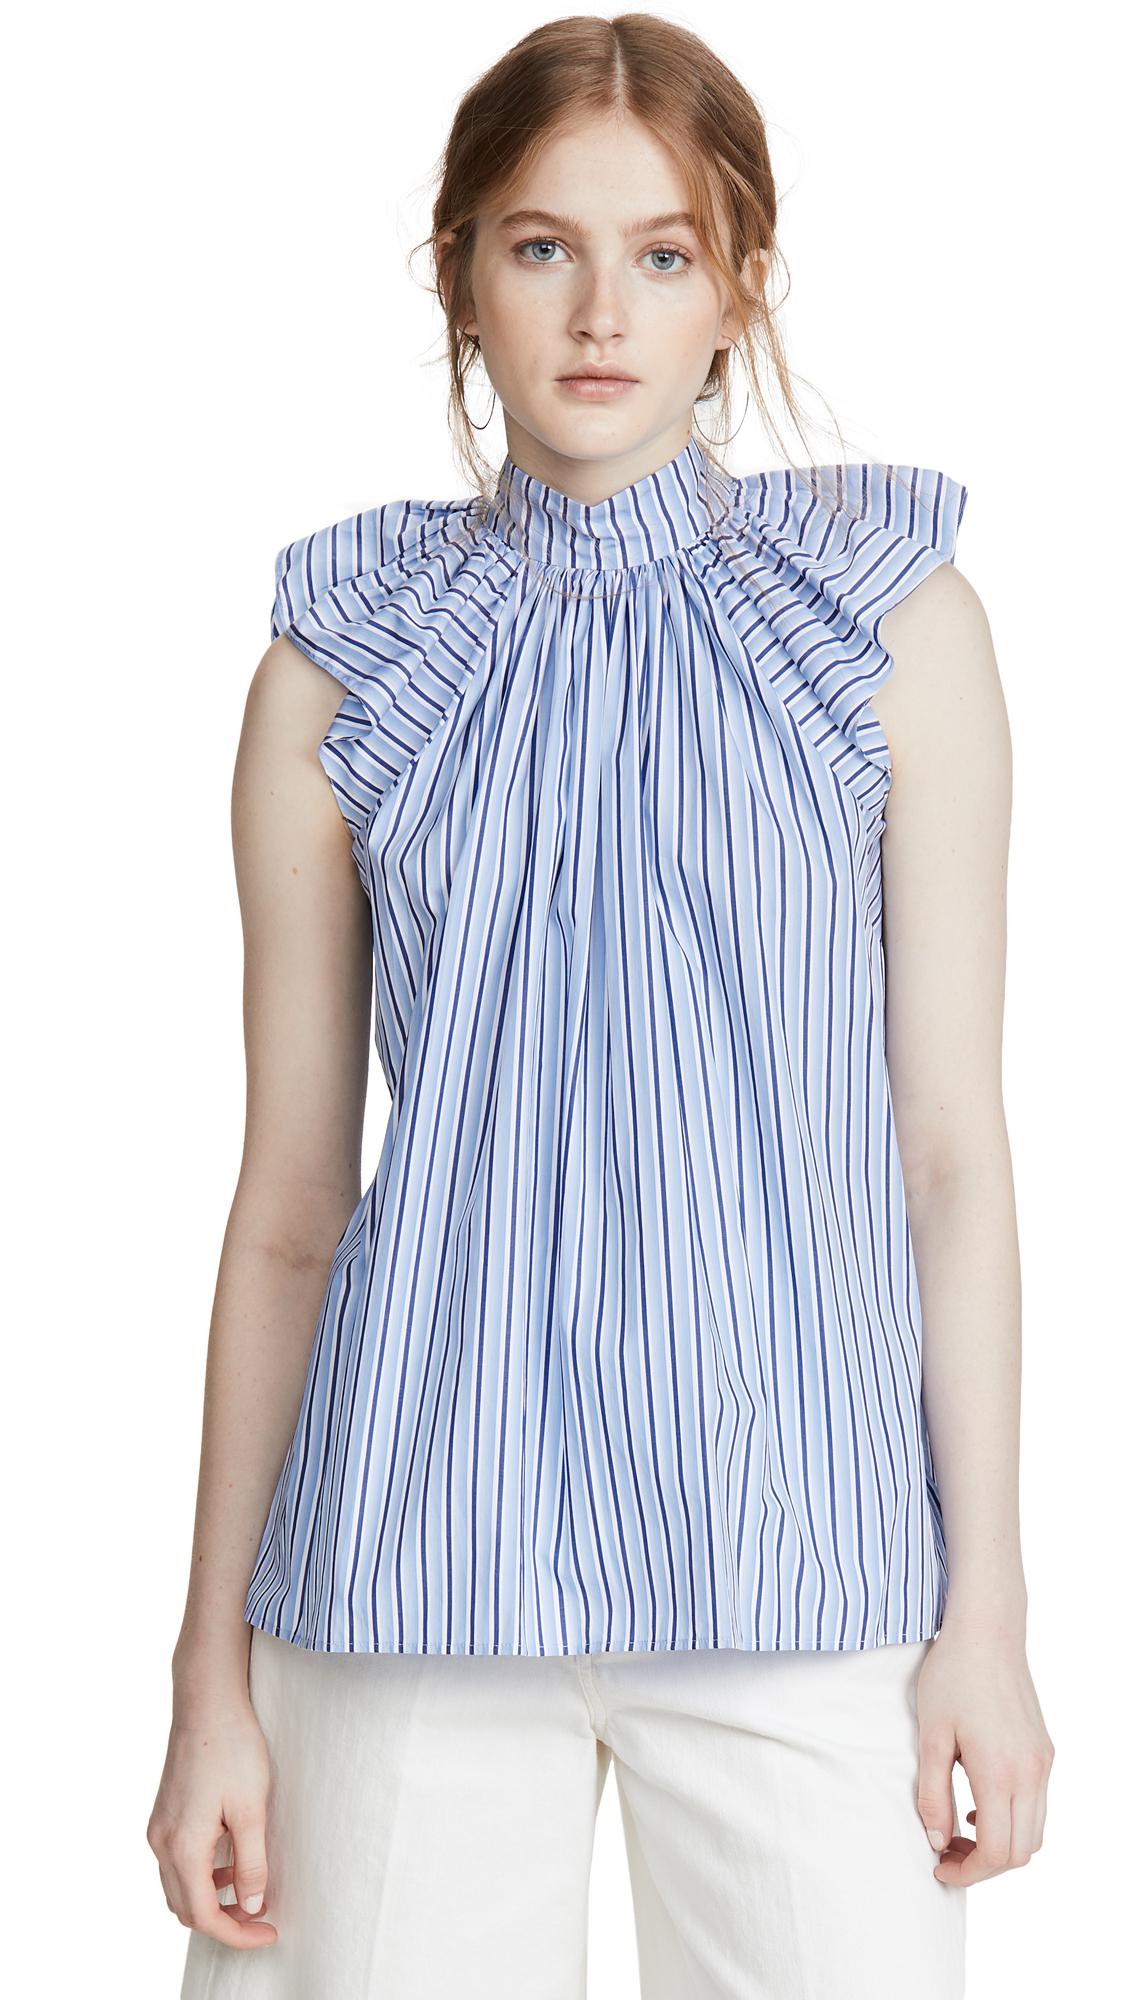 Victoria Victoria Beckham Ruched Shoulder Sleeveless Top - 30% Off Sale